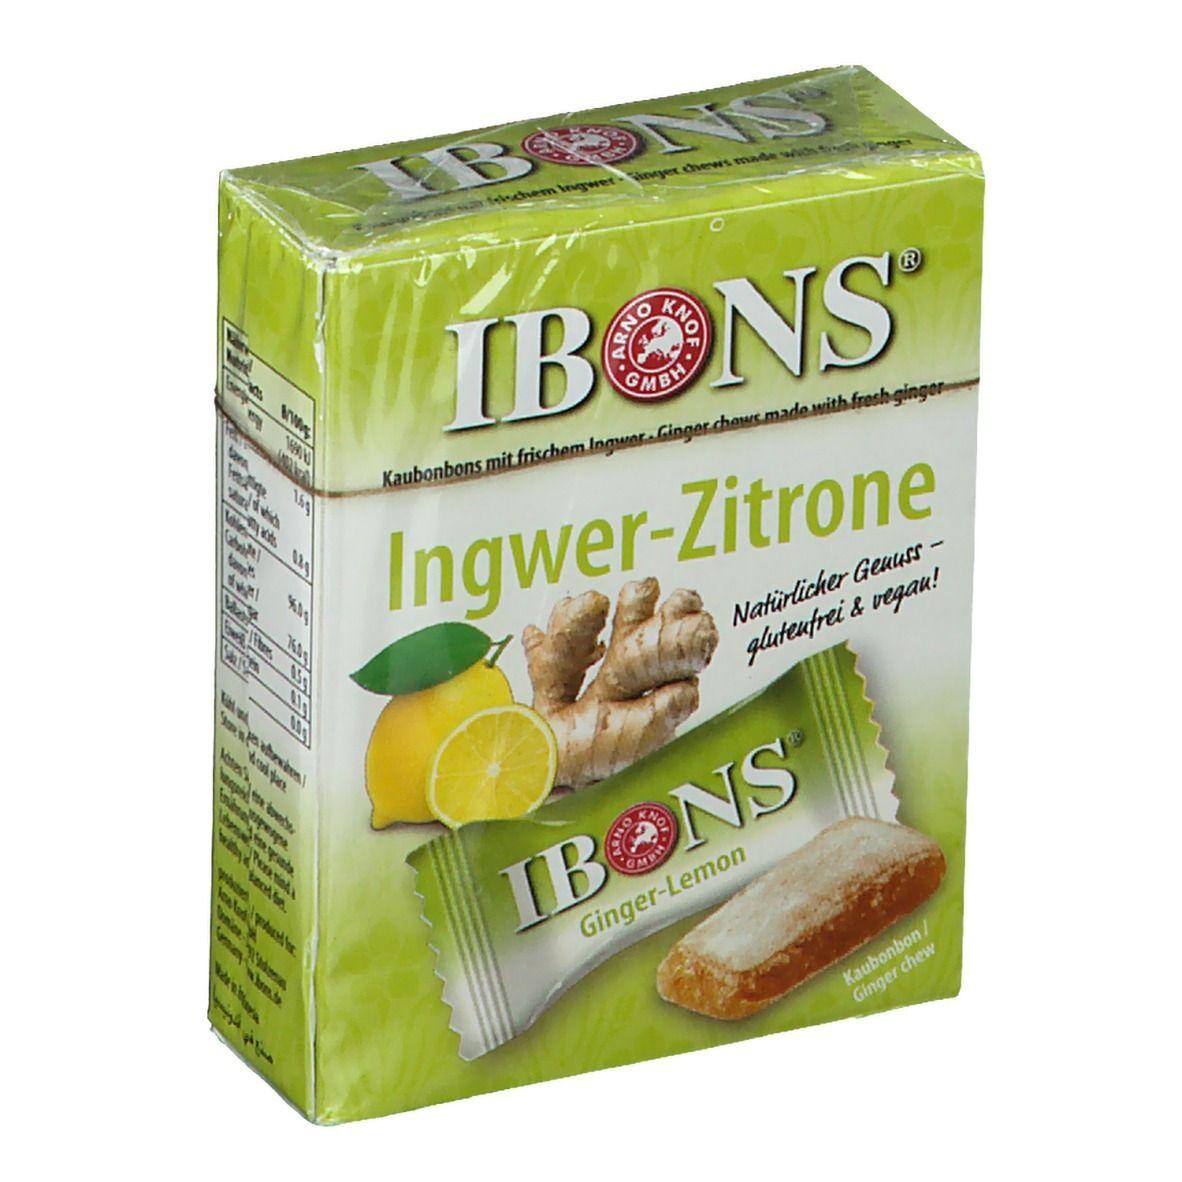 Image of IBONS® Ingwer-Zitrone Box